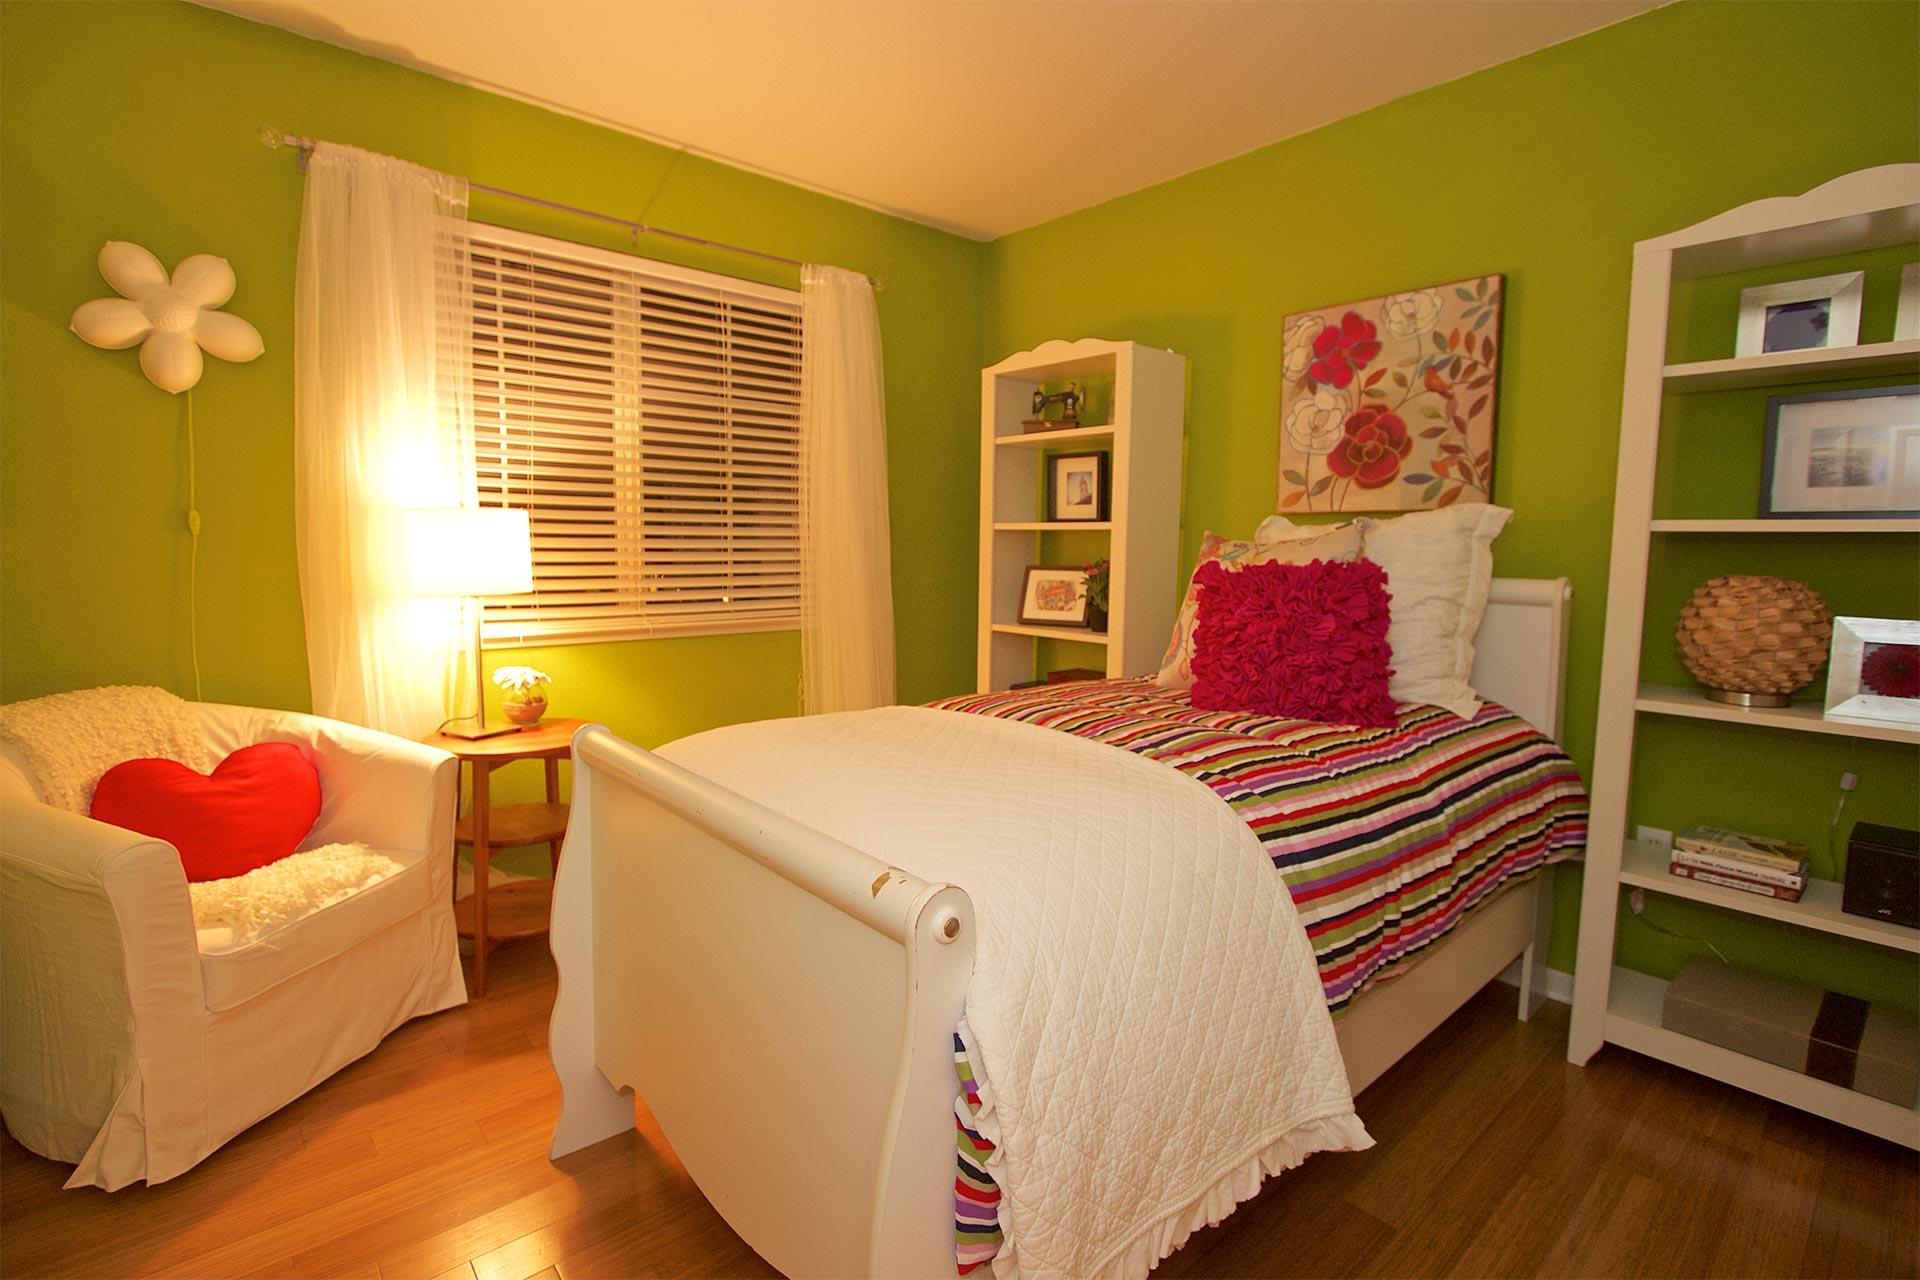 After-Bedroom 3